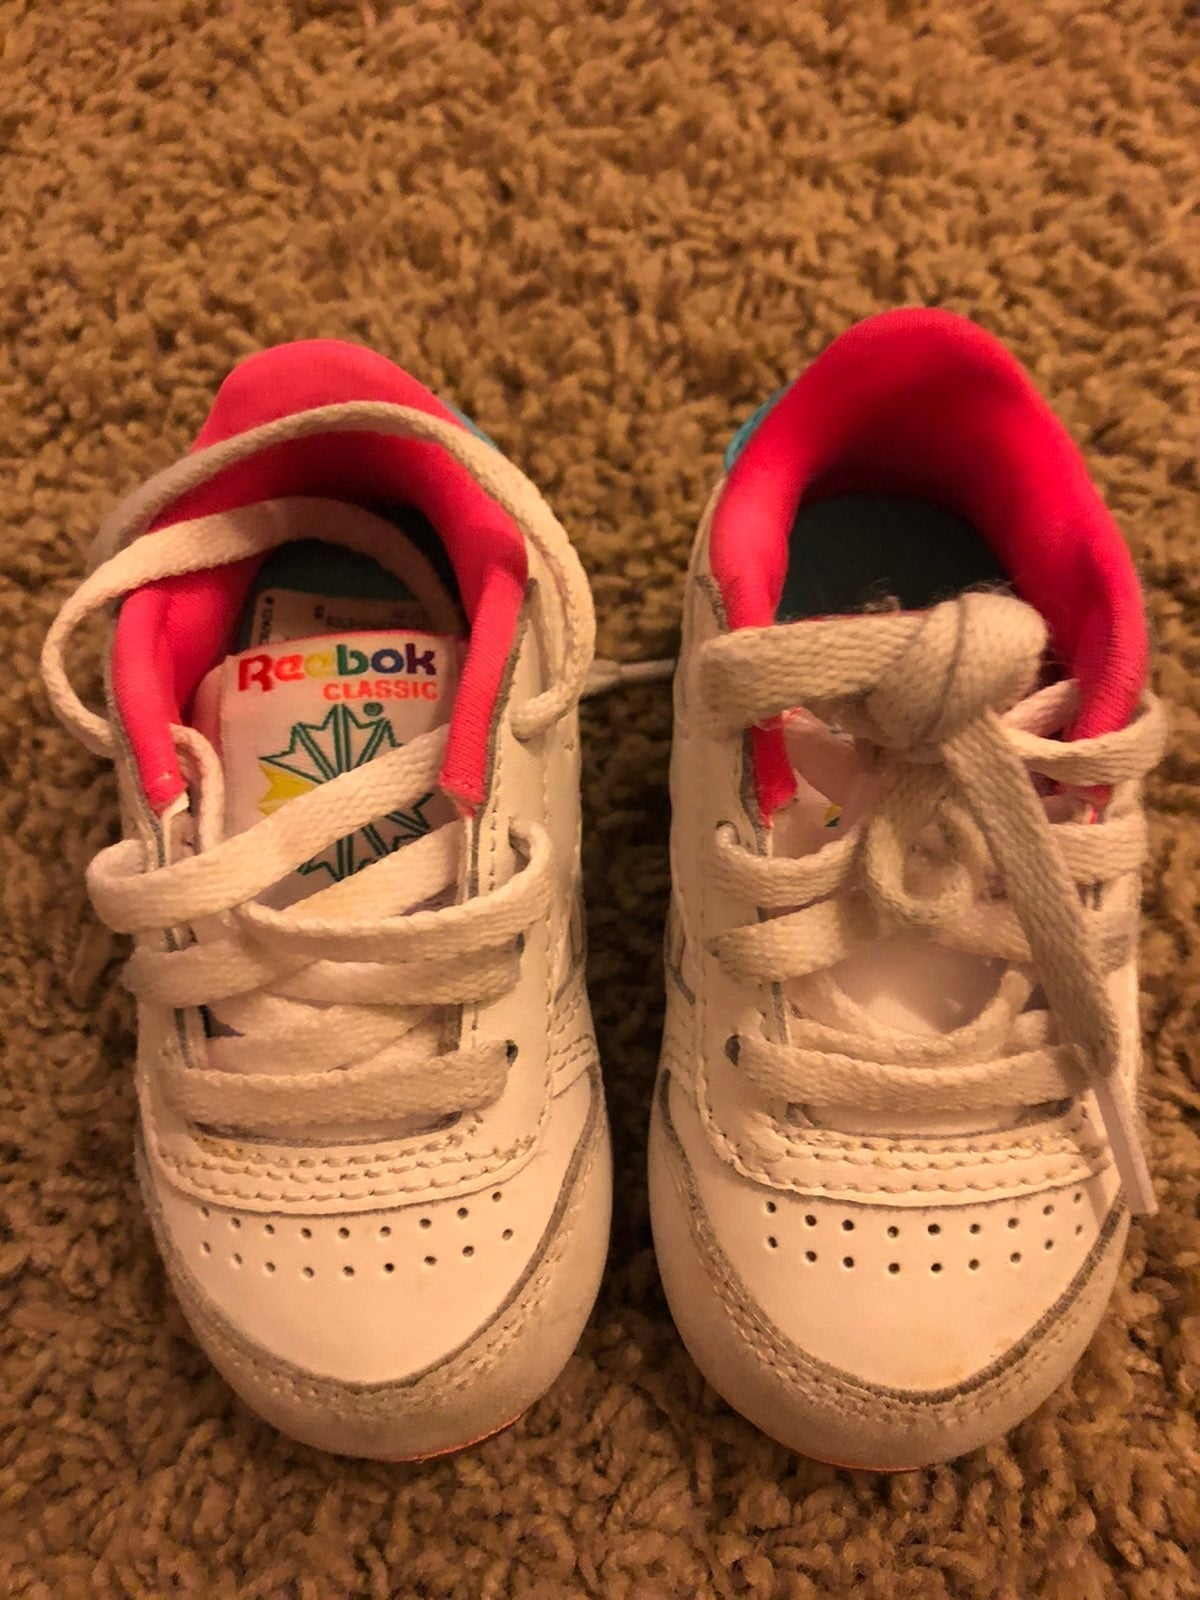 Reebok baby hard bottom shoes